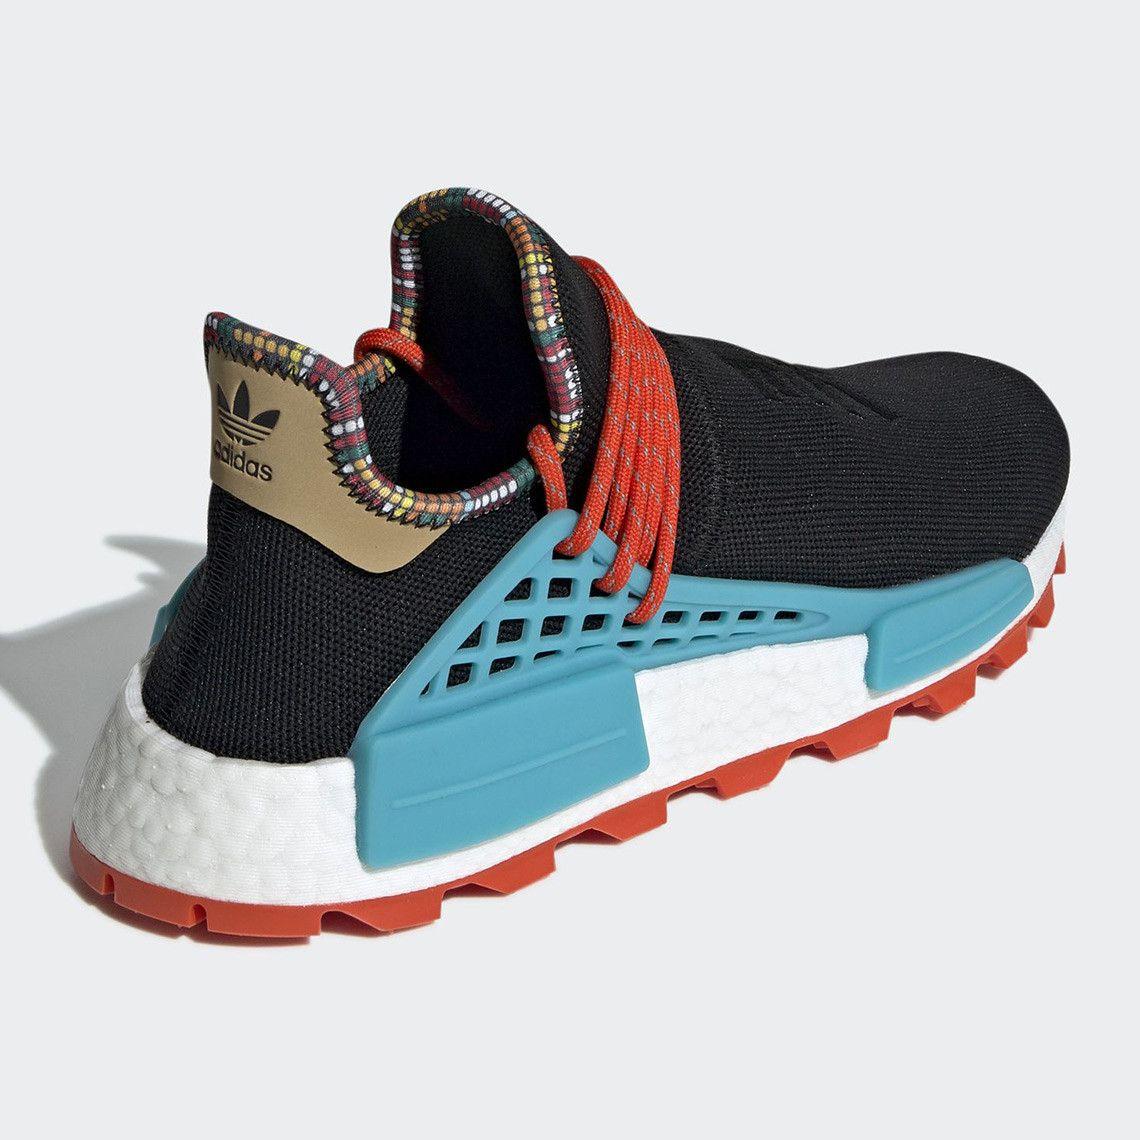 reputable site cef3b 85d32 Pharrell adidas NMD Hu Inspiration Pack Photos + Release Info  SneakerNews. com